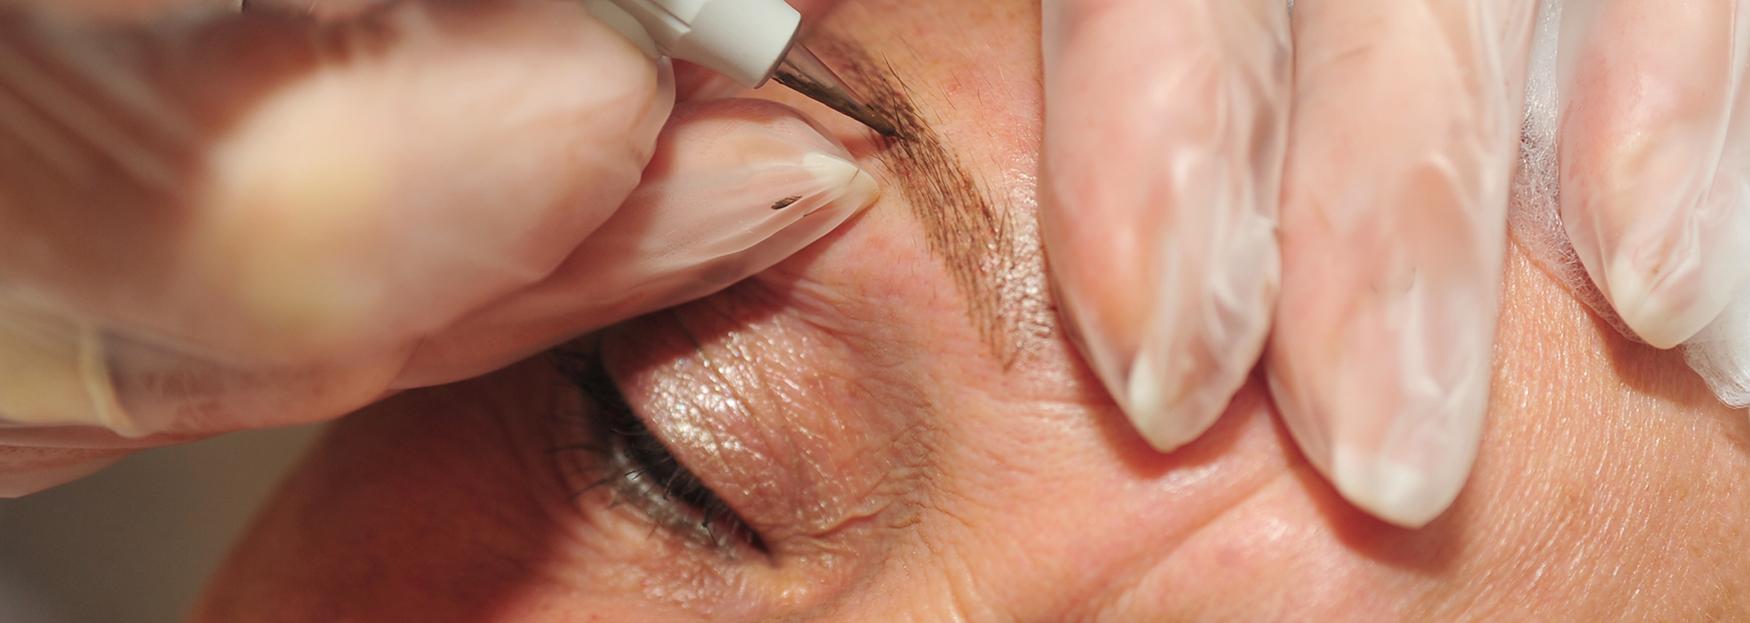 Eyebrow Treatment in progress